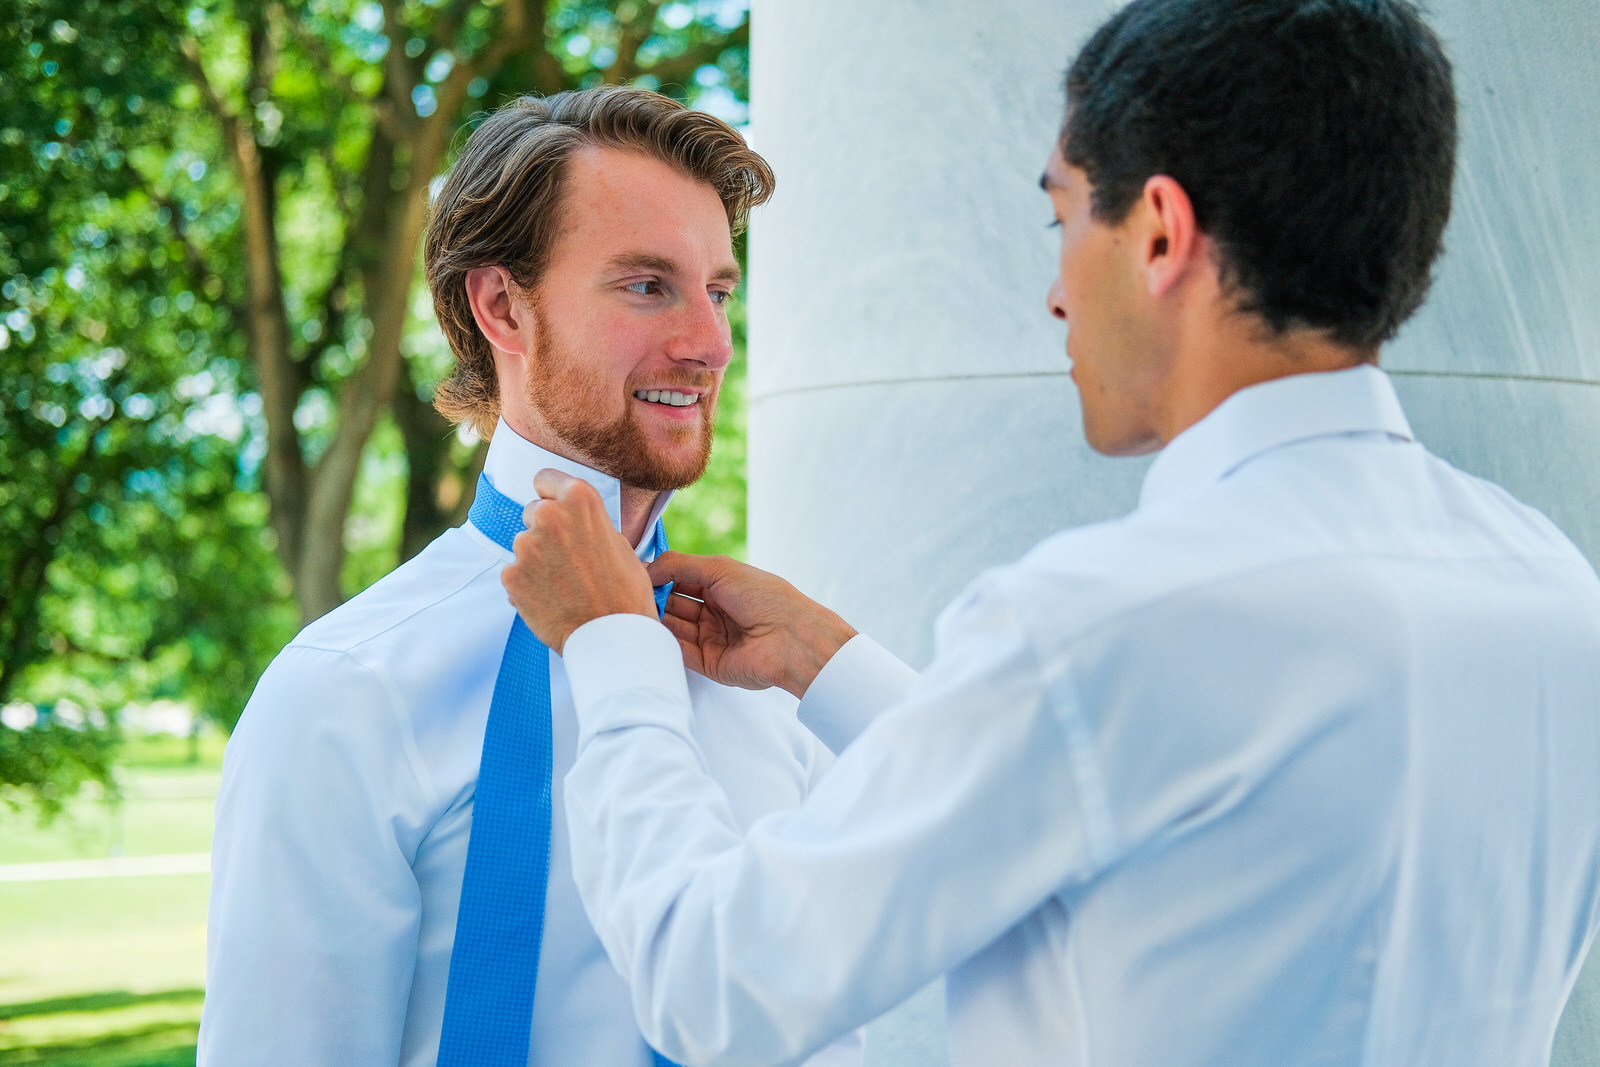 candid-vermont-wedding-photography-16.jpg